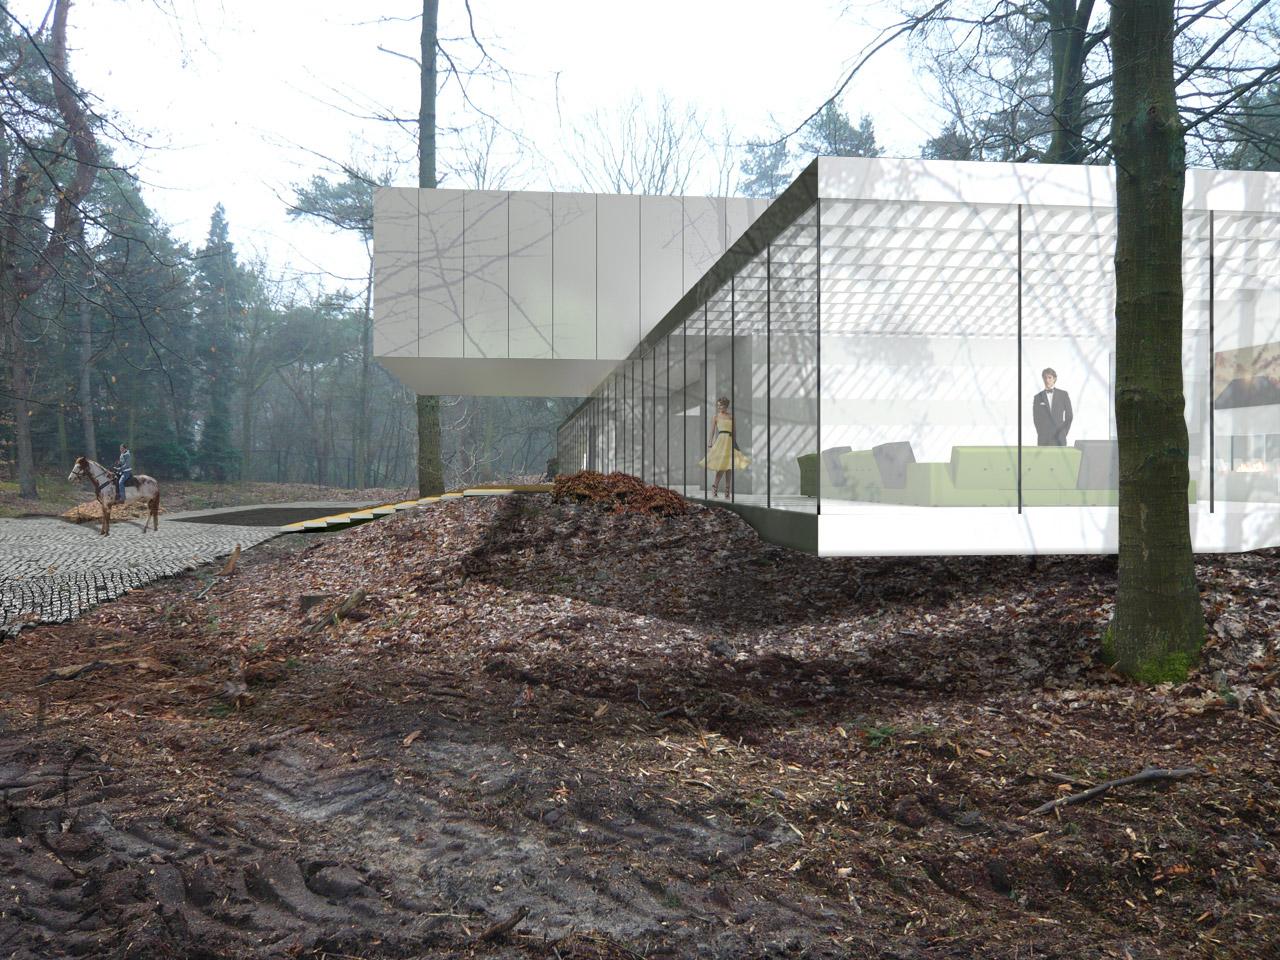 123dv   bos en duin   architecture   moderne villa's